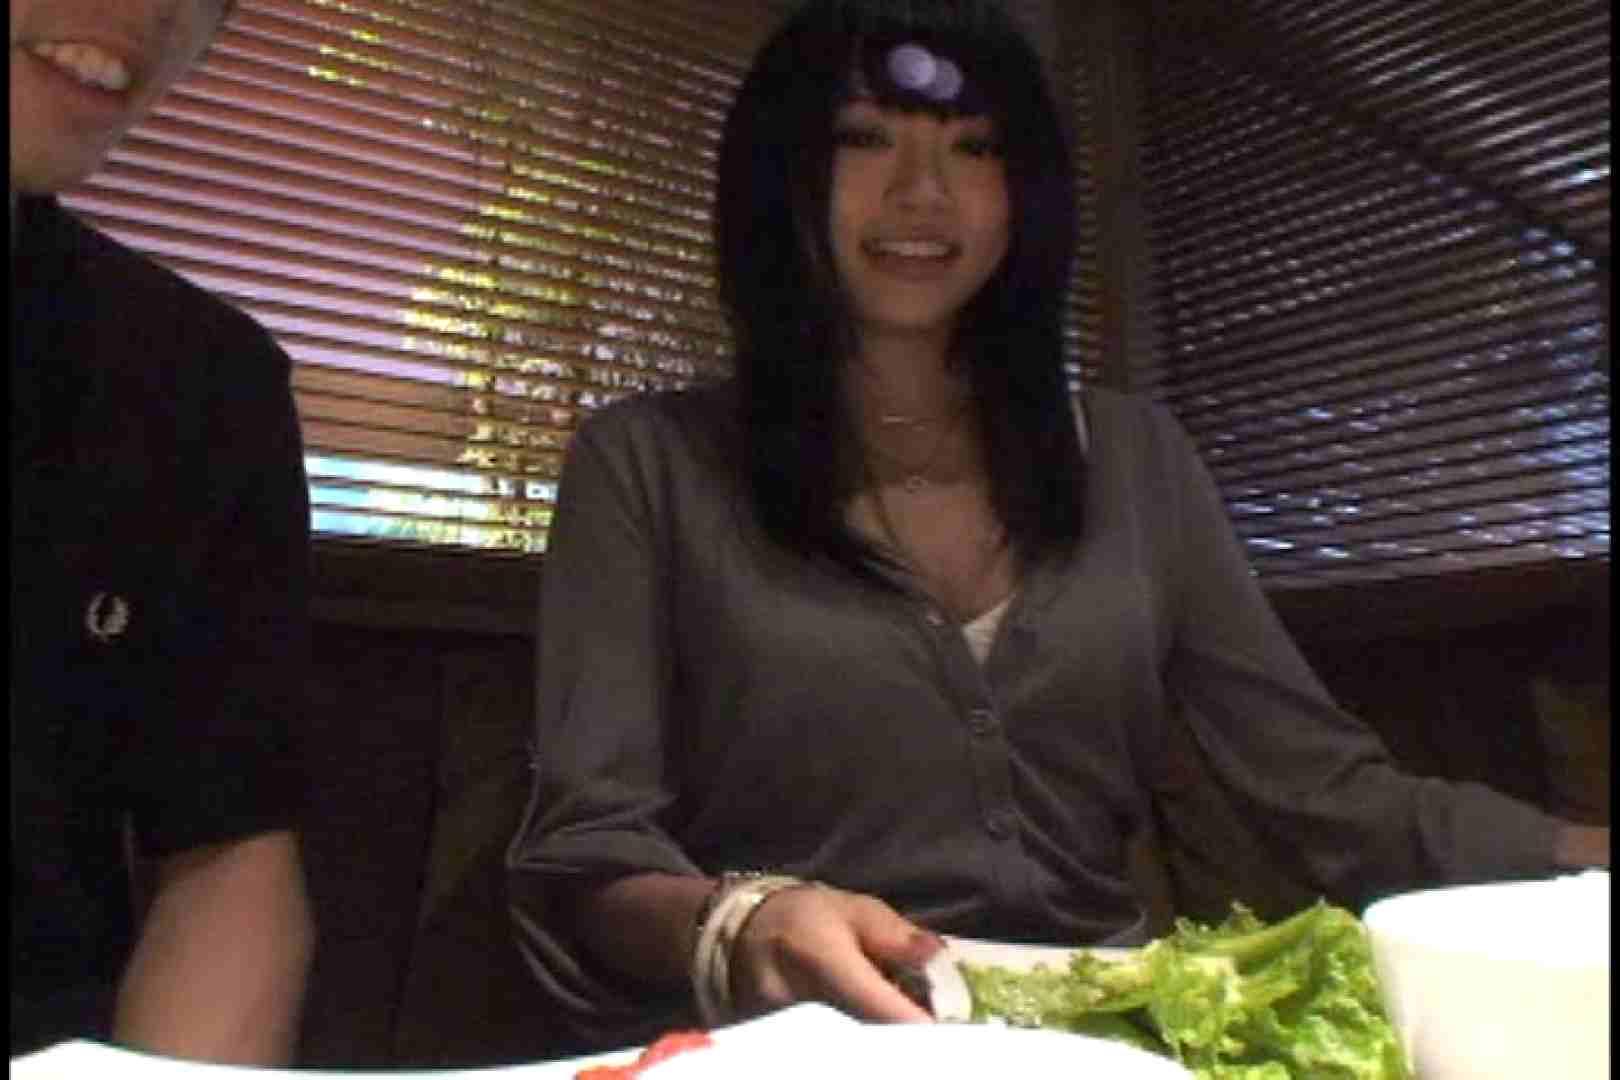 JDハンター全国ツアー vol.033 前編 女子大生のエロ動画  108PIX 44